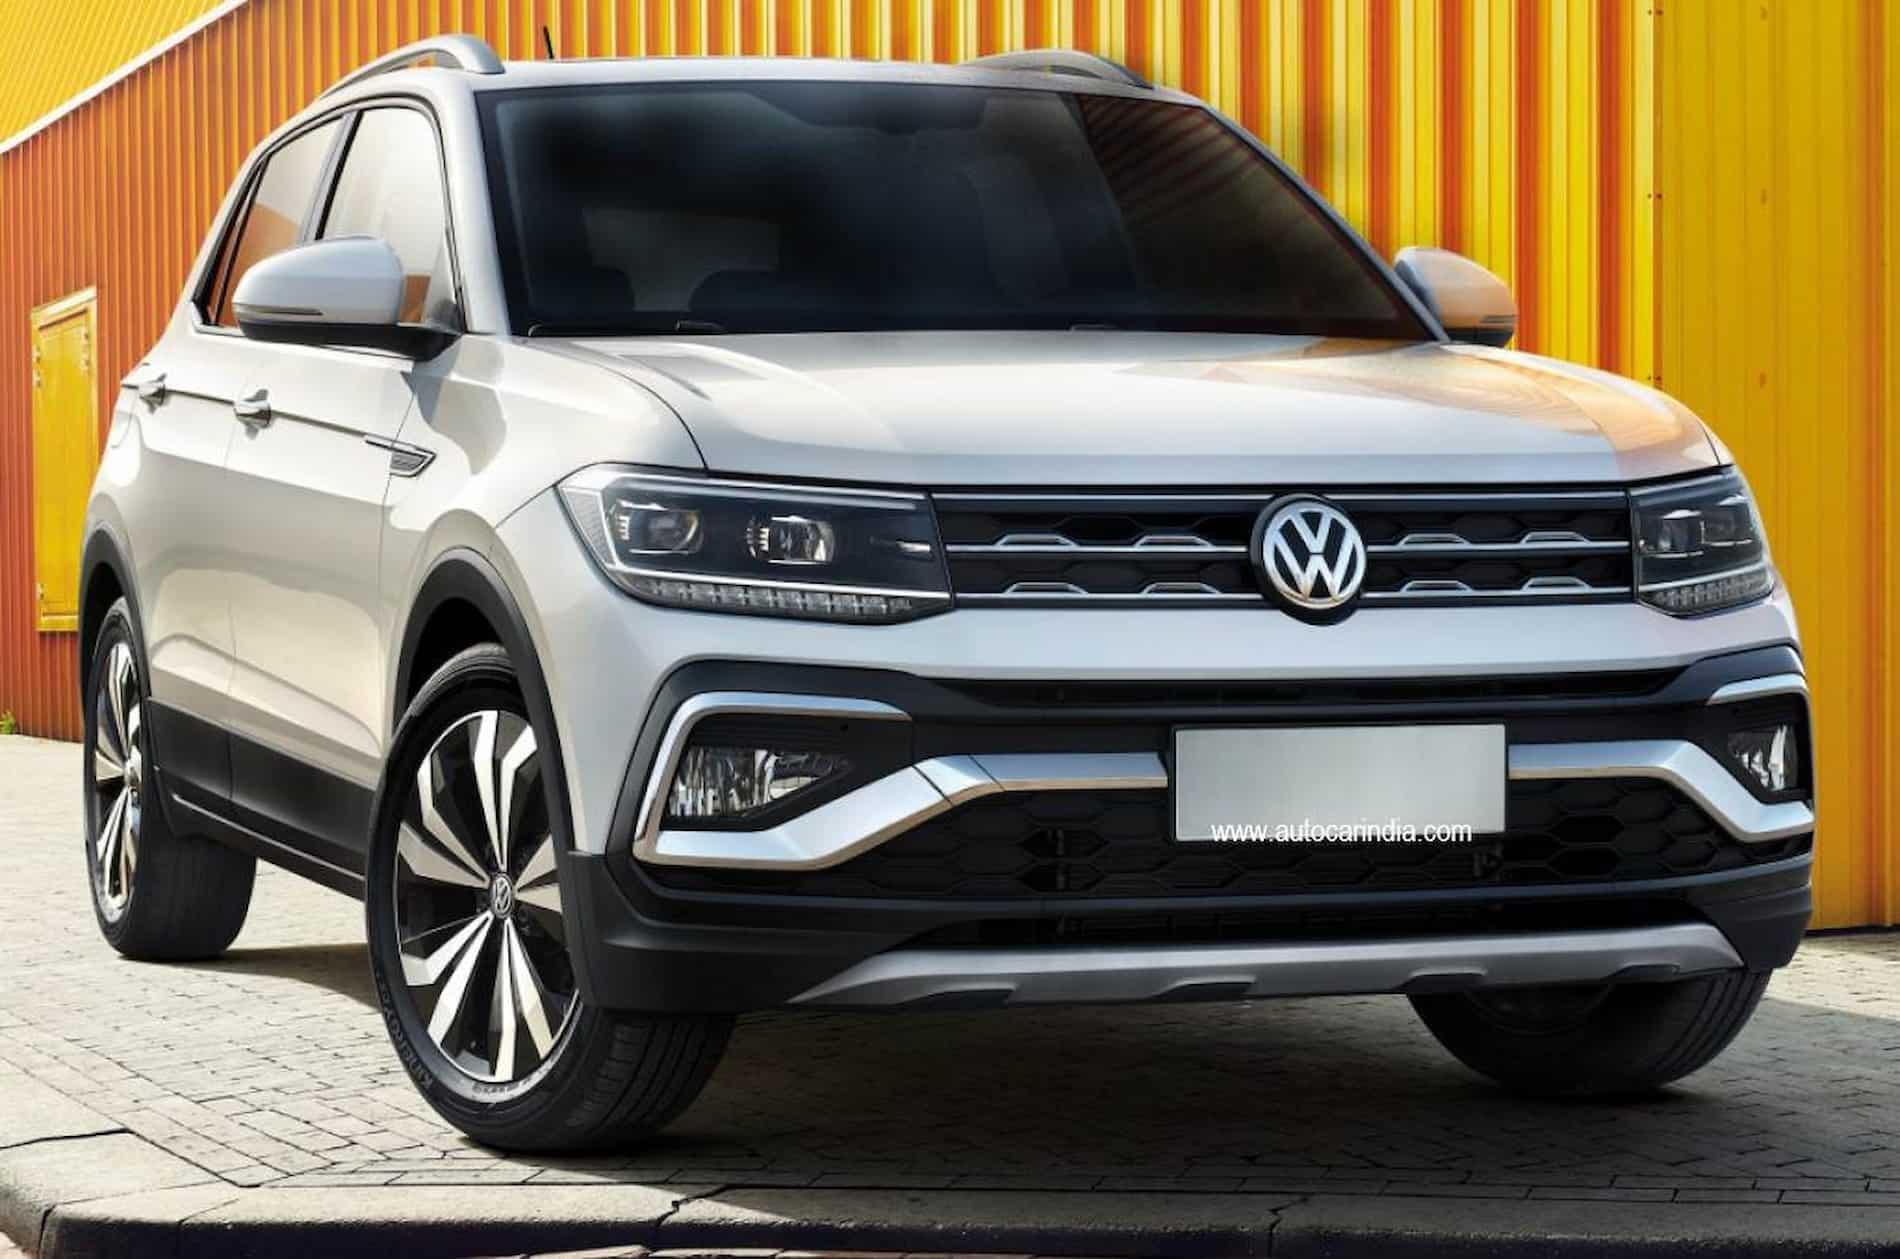 20210323101141 VW Taigun t cross 1